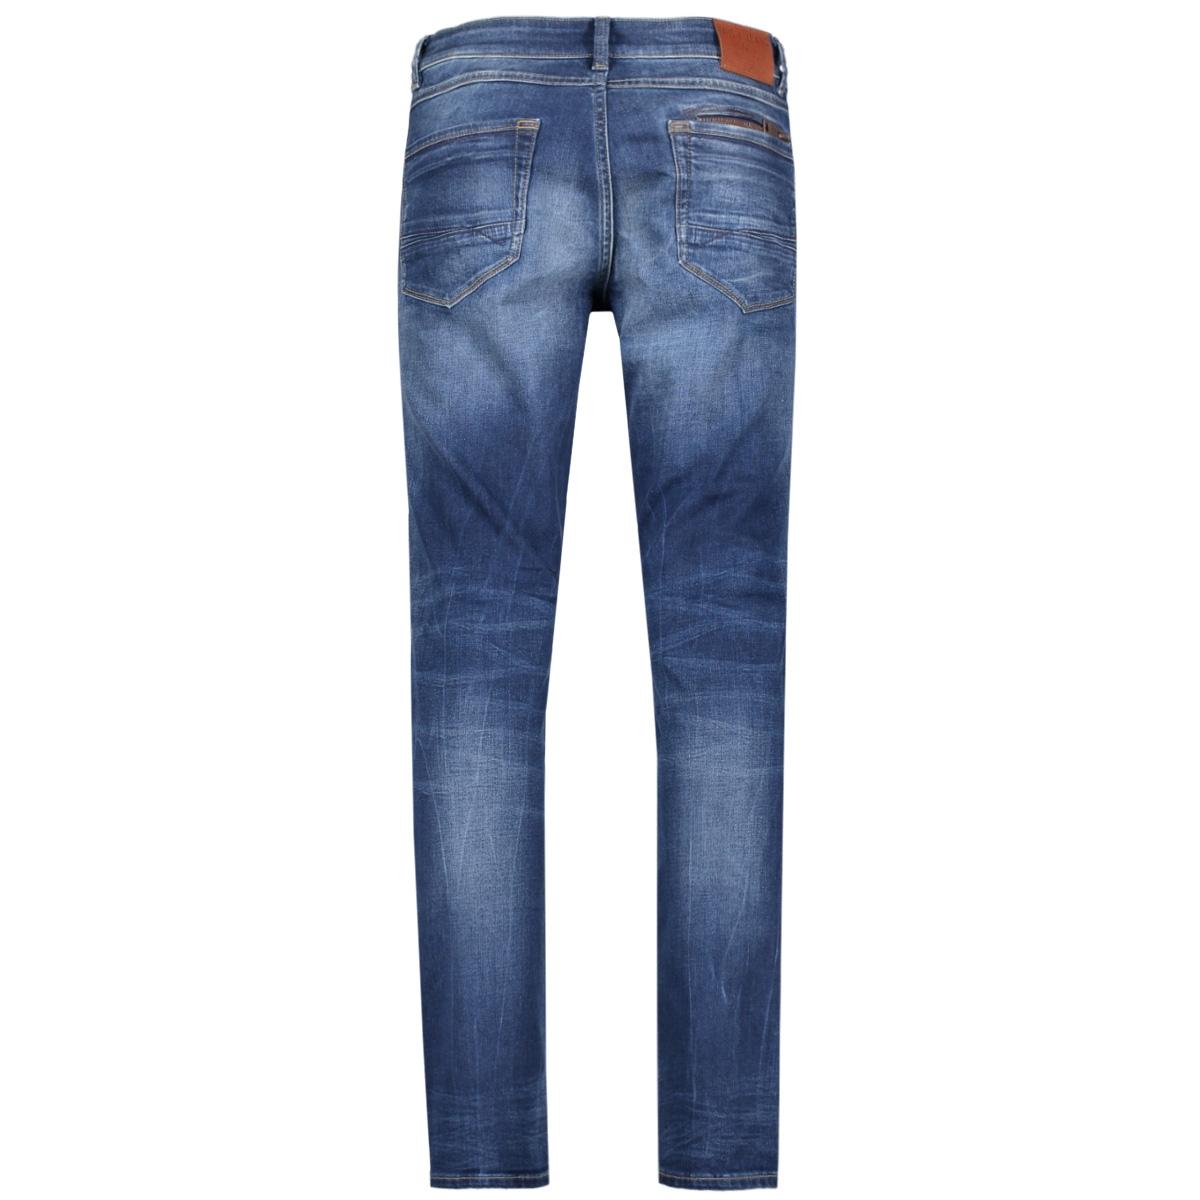 657 fermo garcia jeans 2280 blue abyss